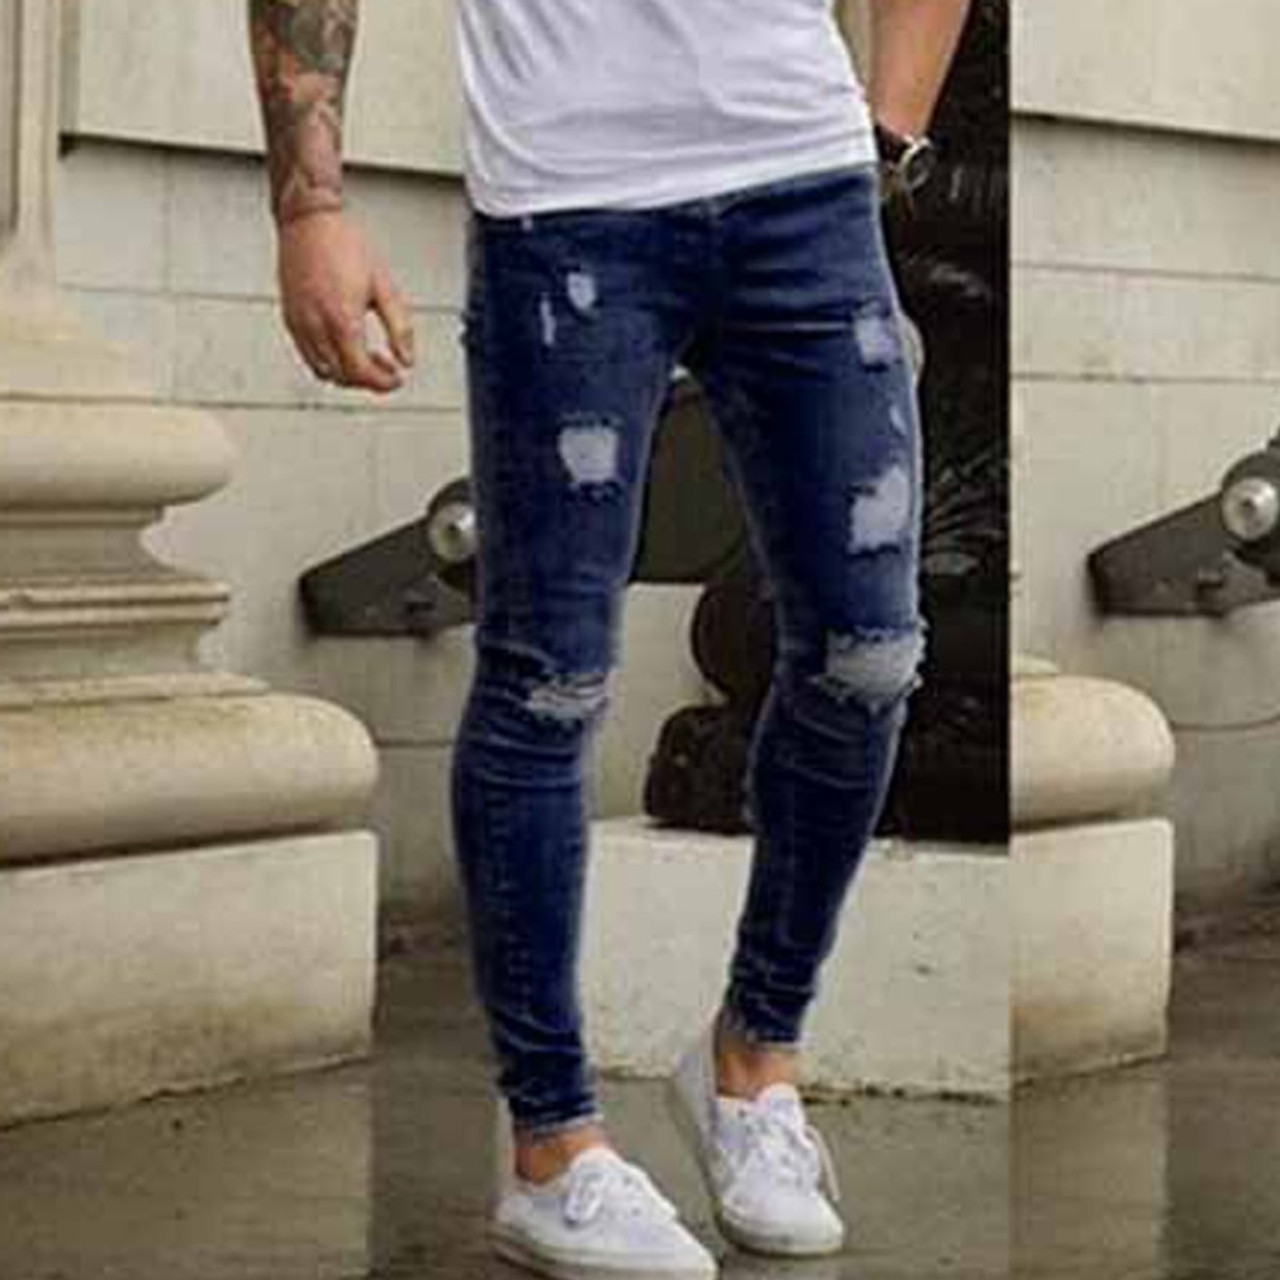 fb369018d1 ... New Men's Ankle Length Slim Jeans Streetwear Holes Summer Ripped Pencil  Pants Trousers Casual Denim Skinny ...